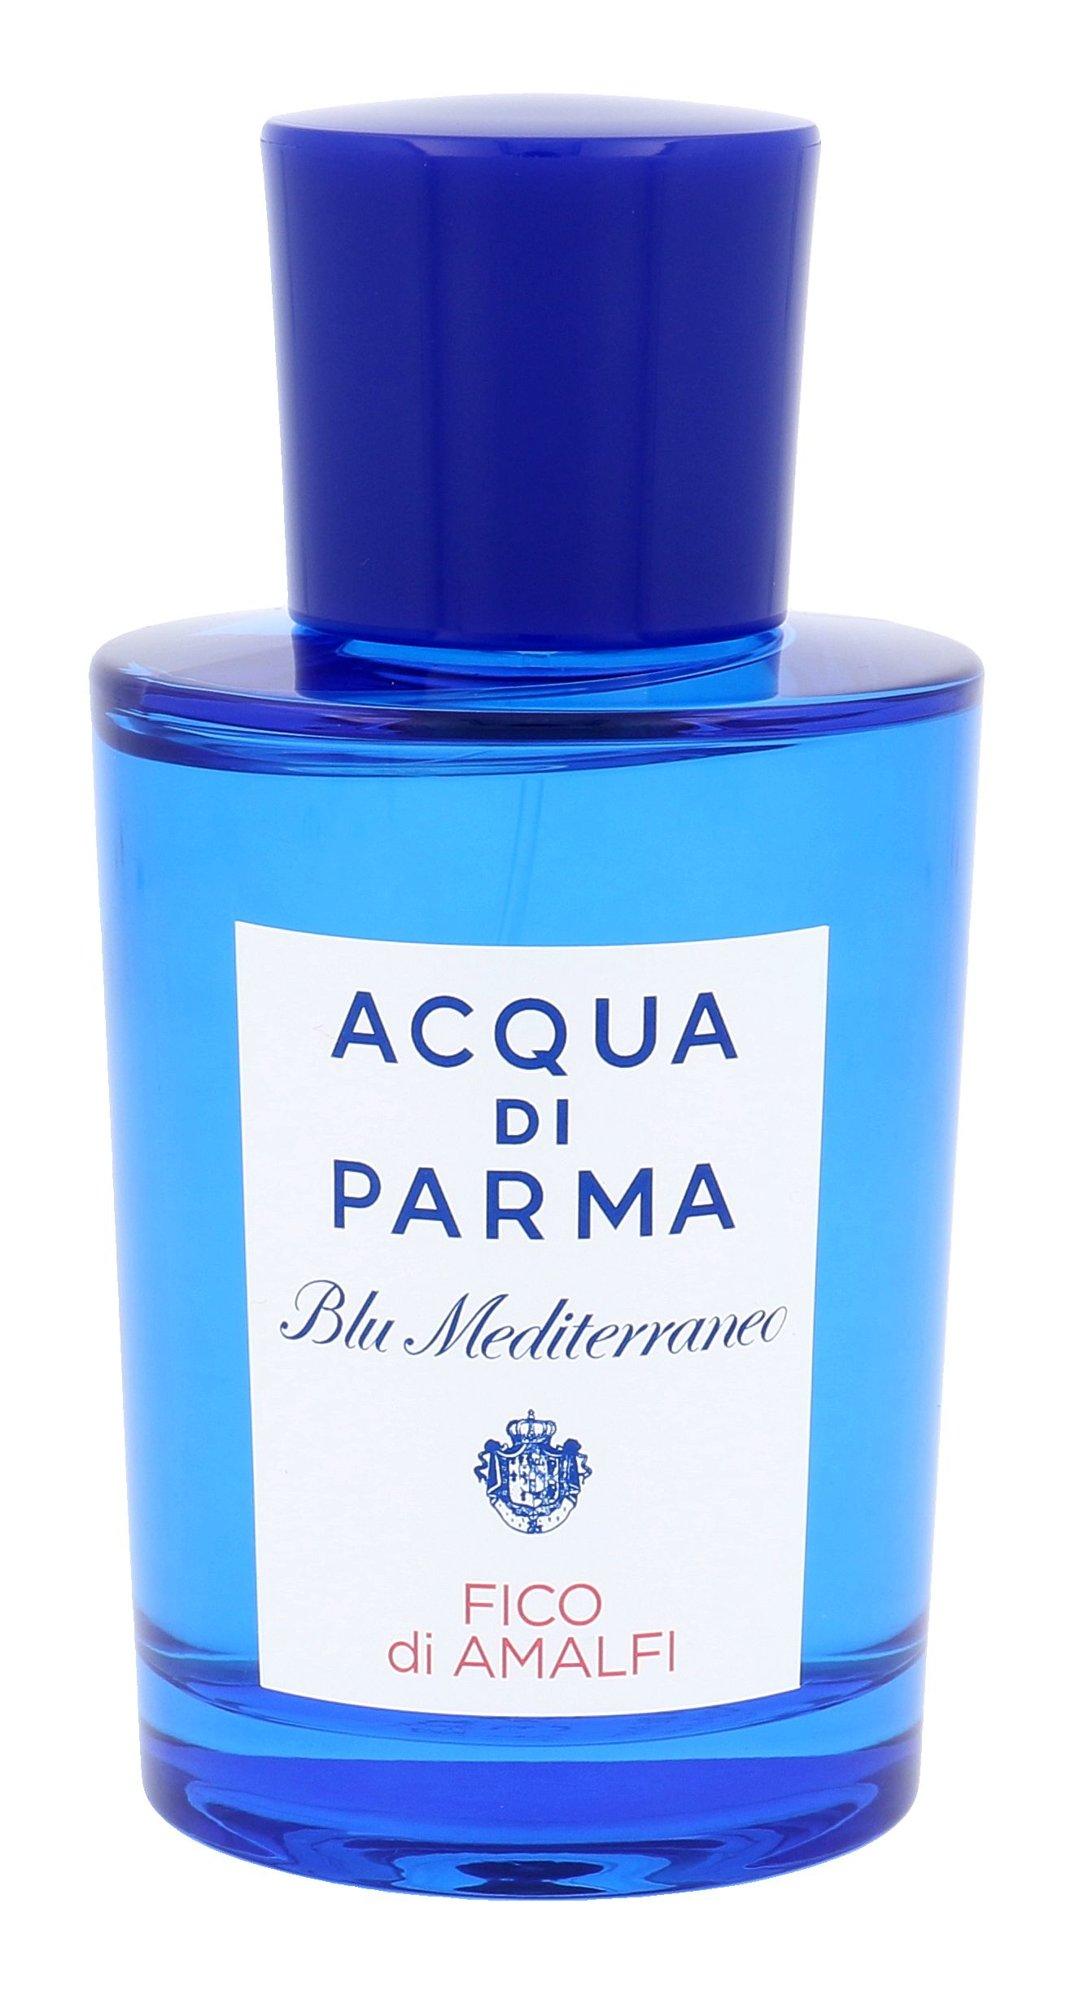 Kvepalai Acqua di Parma Blu Mediterraneo Fico di Amalfi